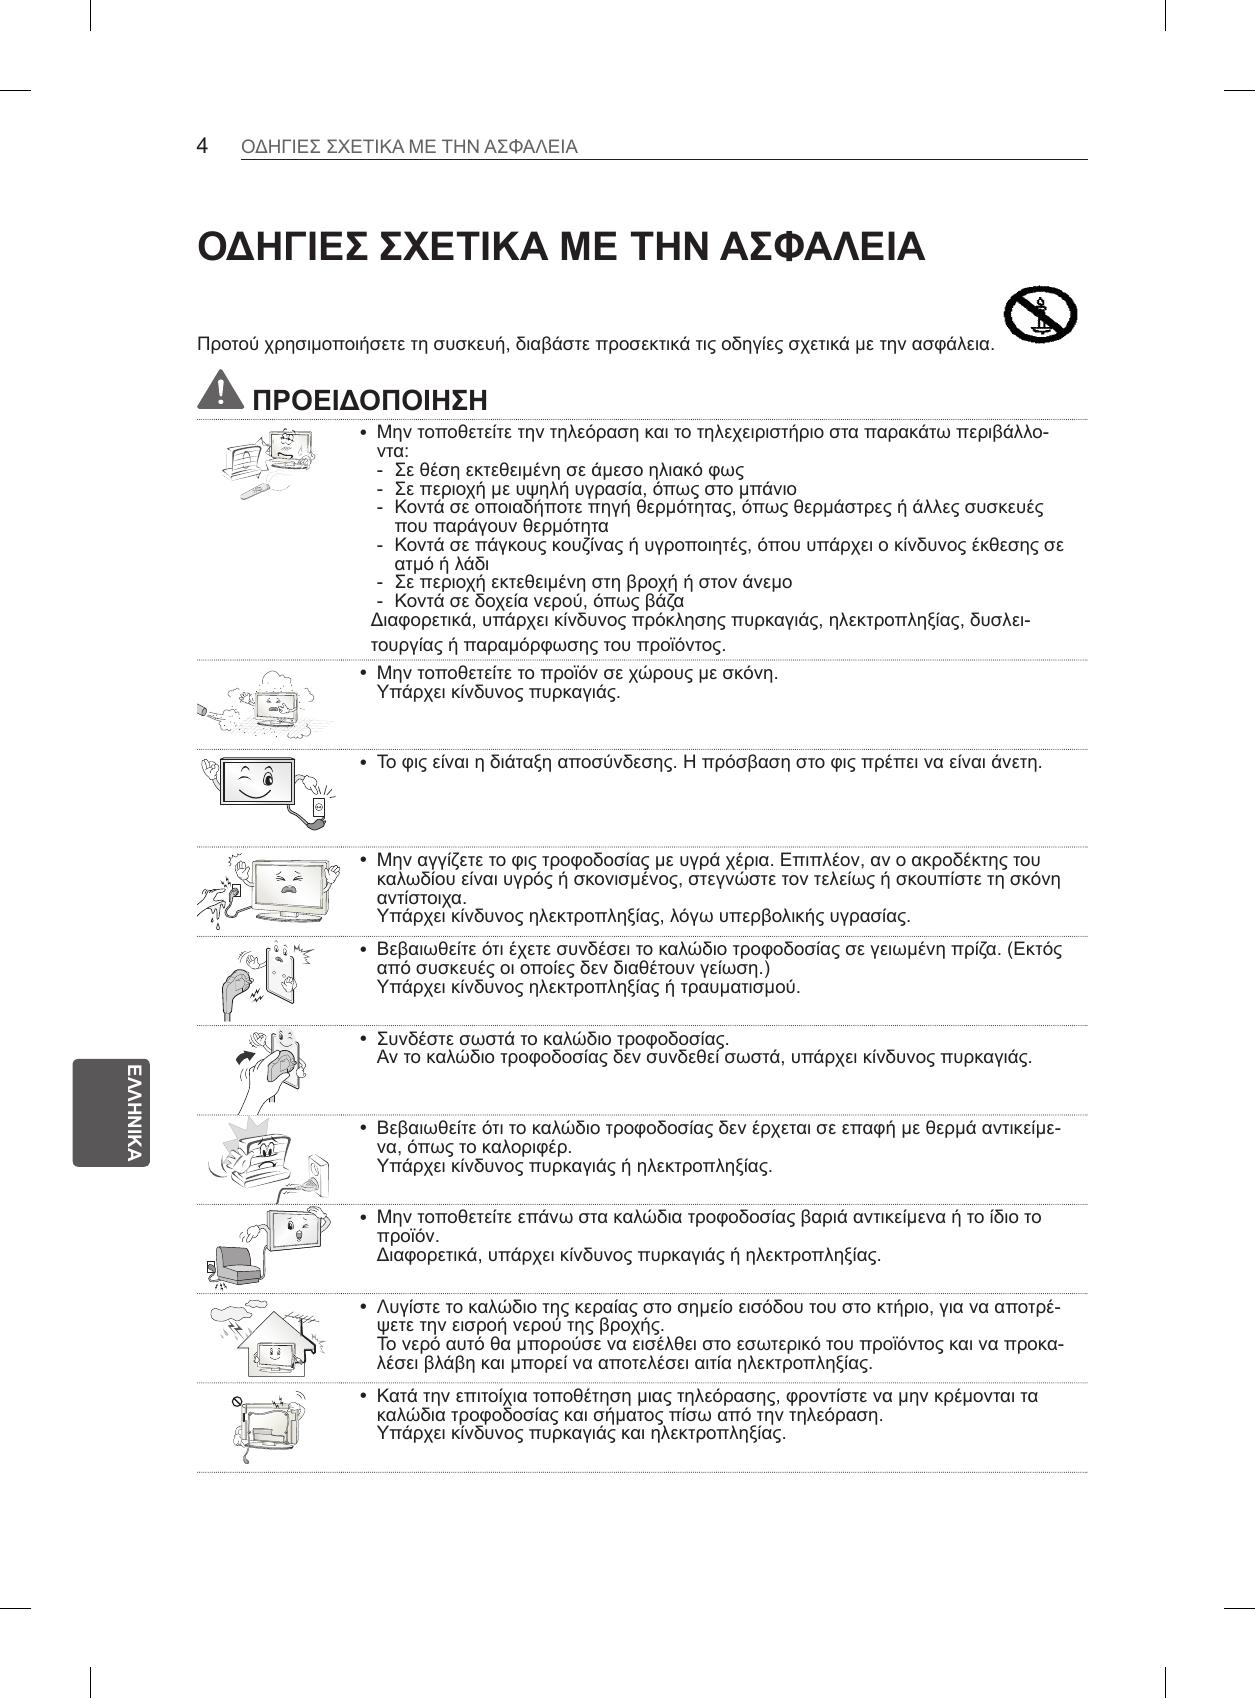 b7920494e69 Lg 47Lm670S Users Manual Microsoft MFL67441704 [호환 모드]